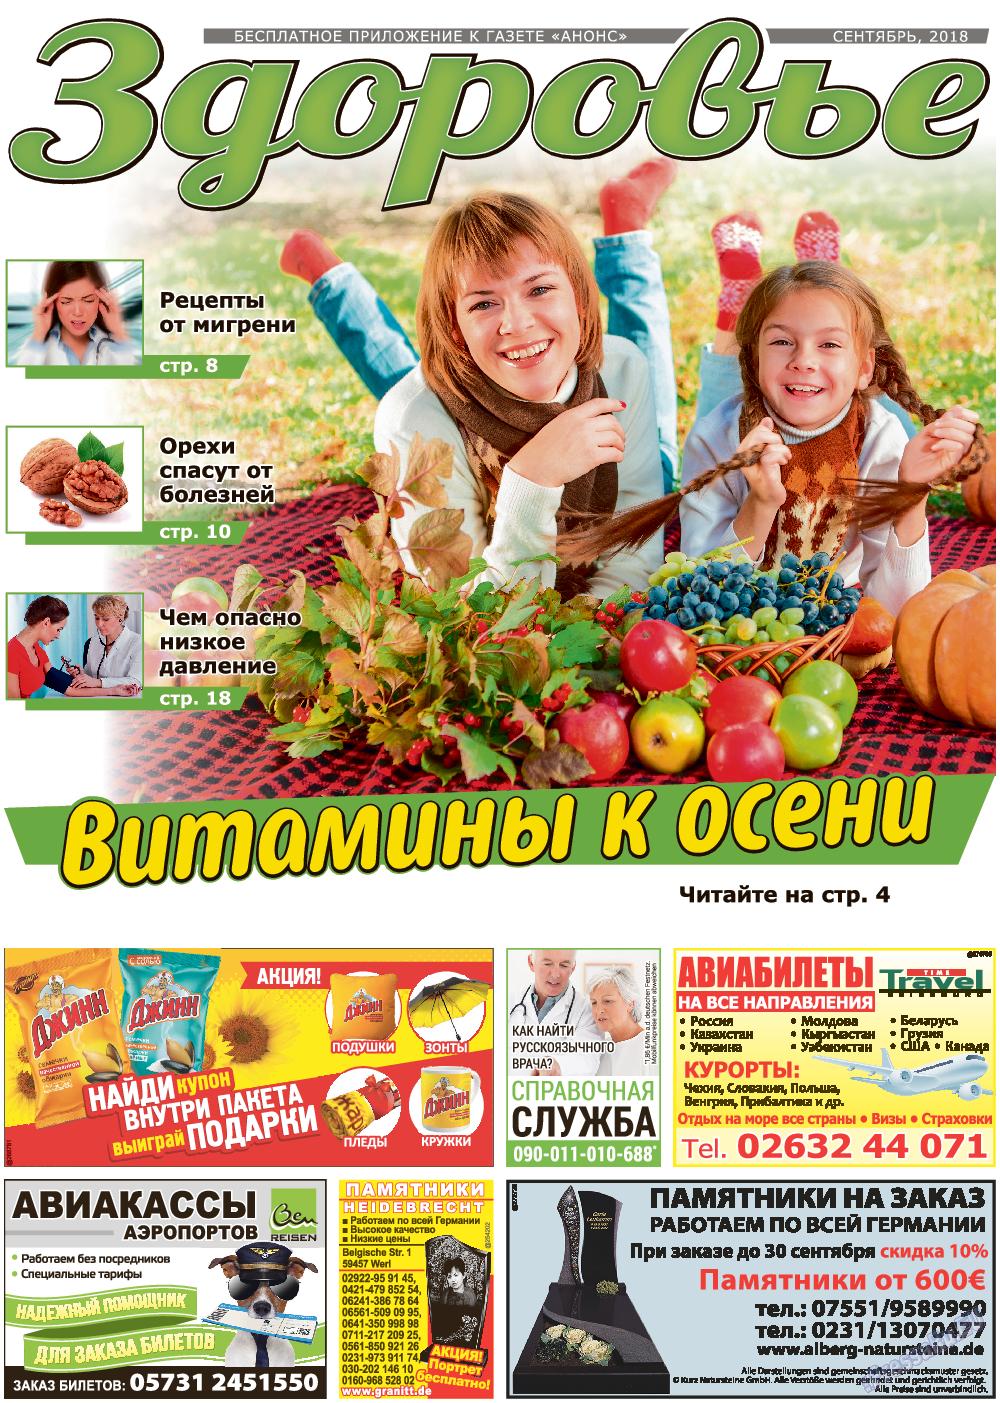 Здоровье (газета). 2018 год, номер 9, стр. 1